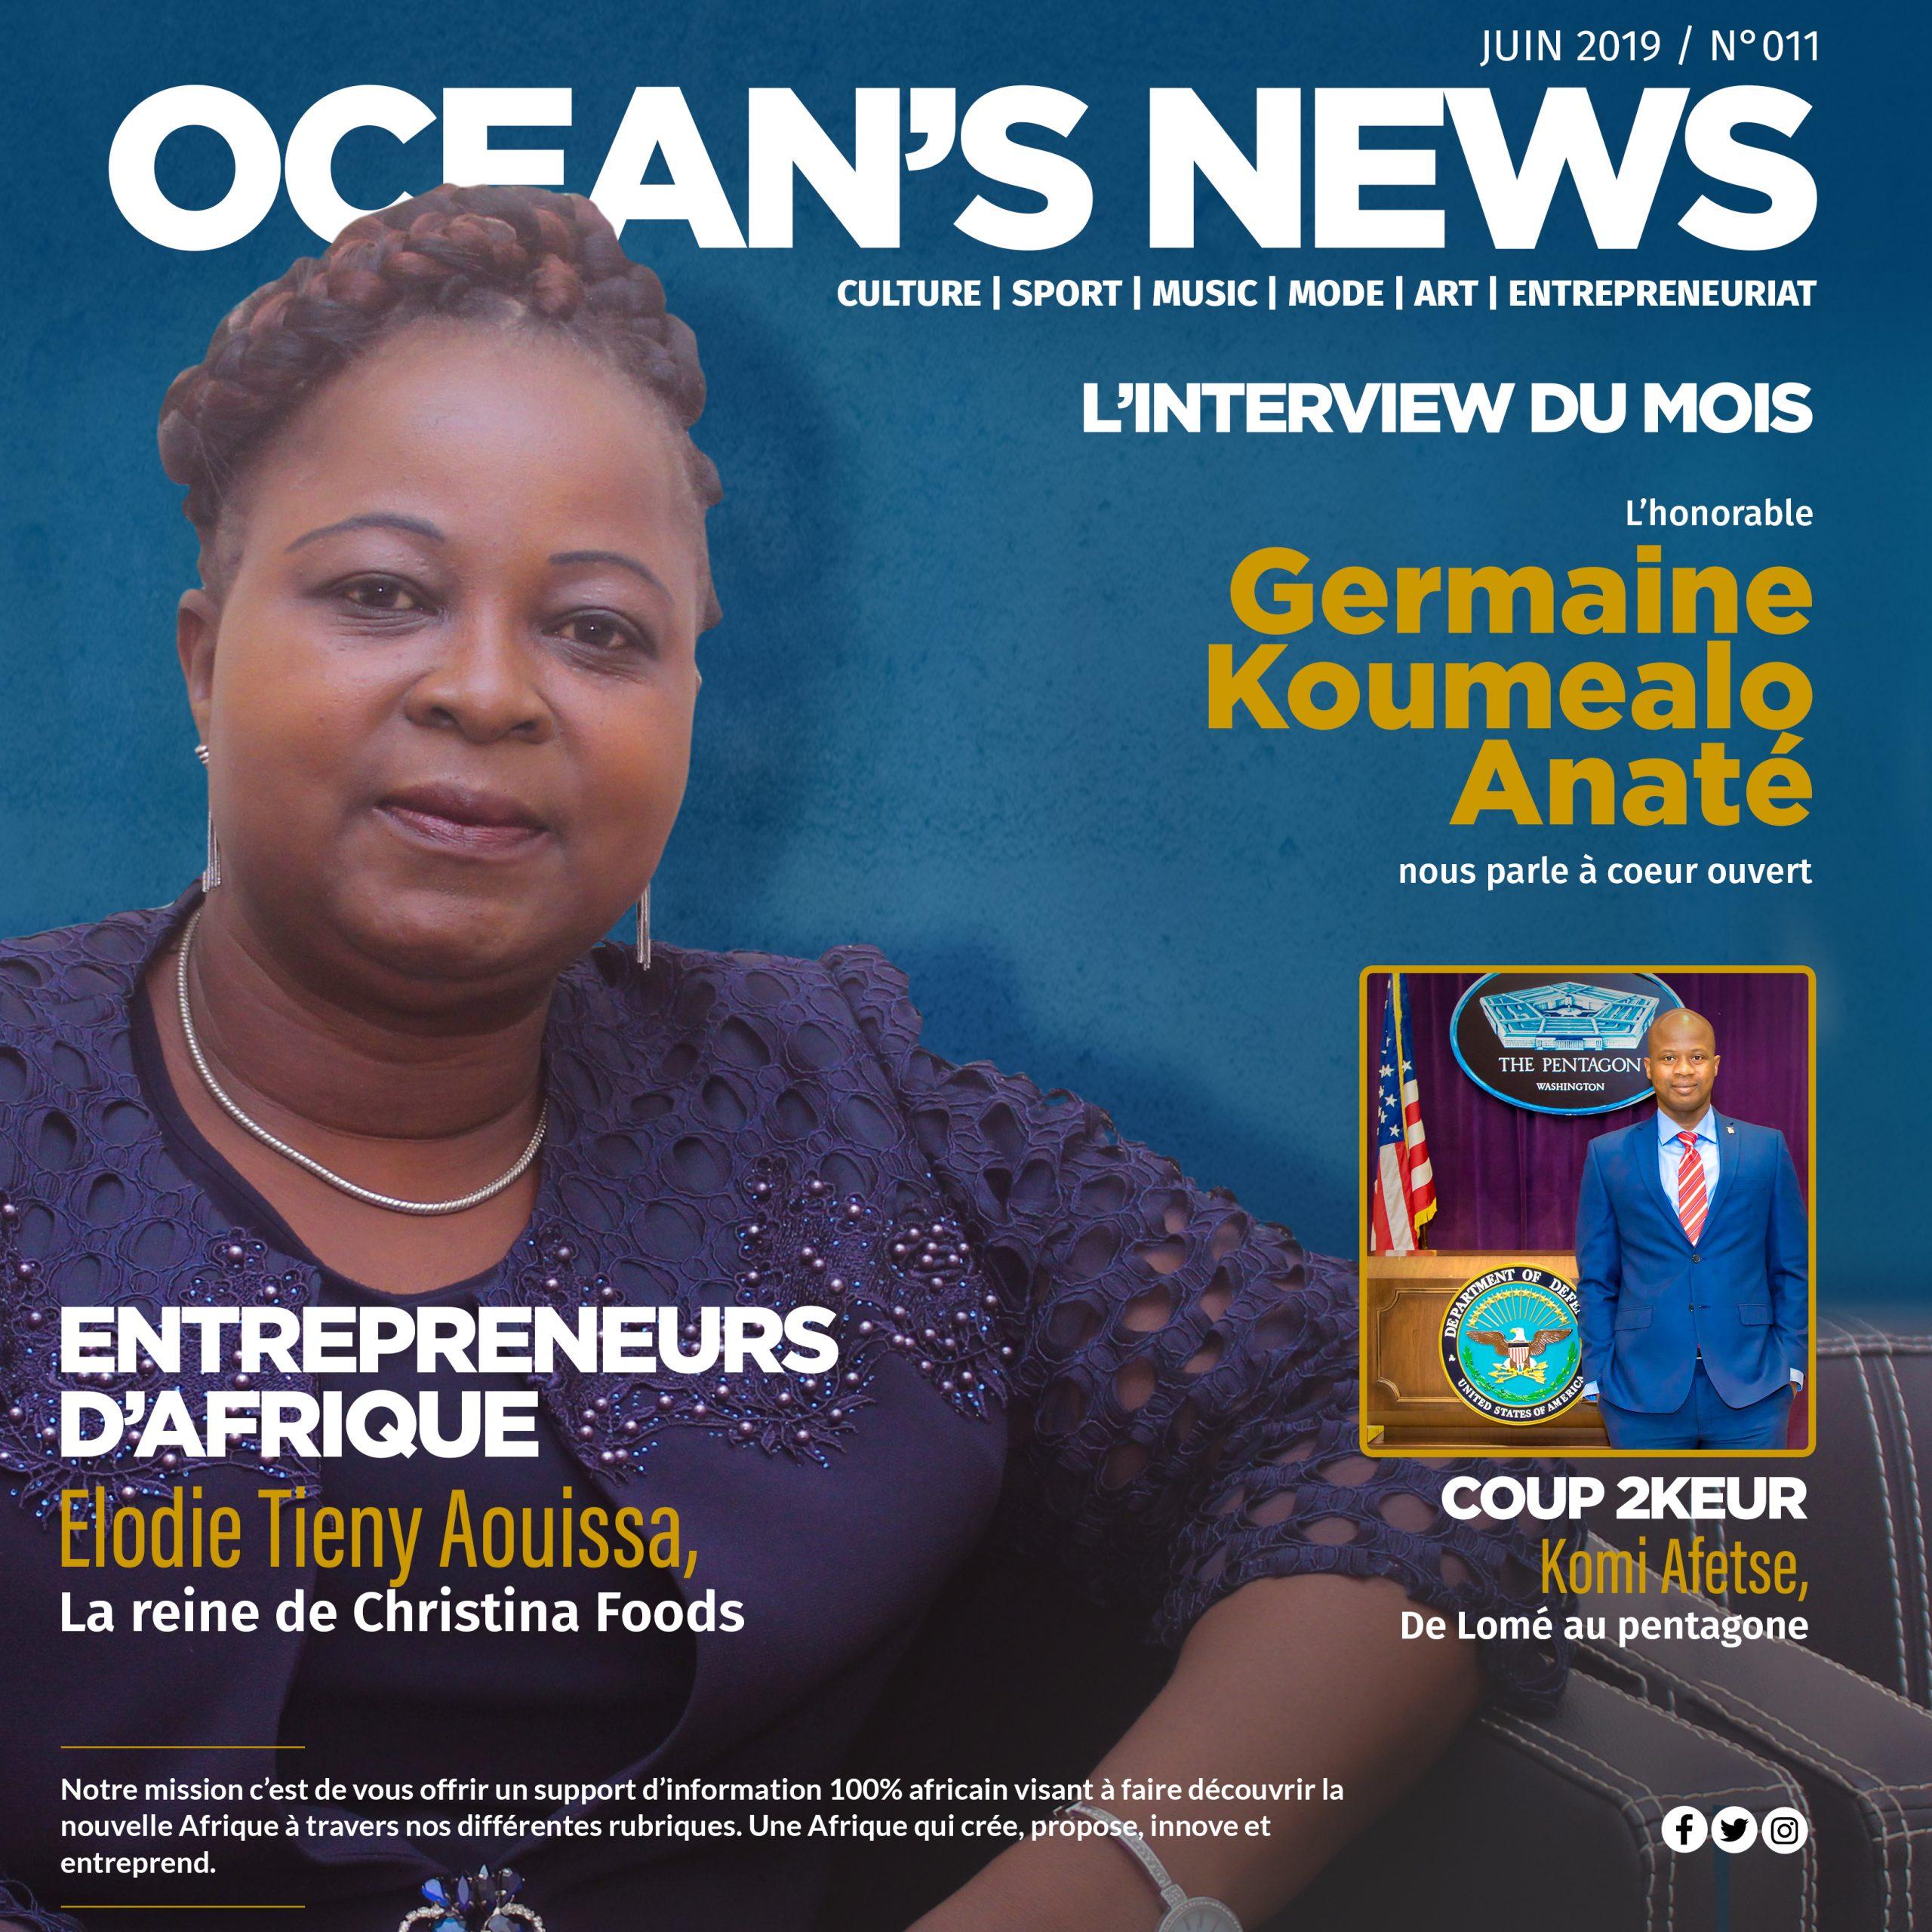 MAGAZINE OCEAN'S NEWS N°11